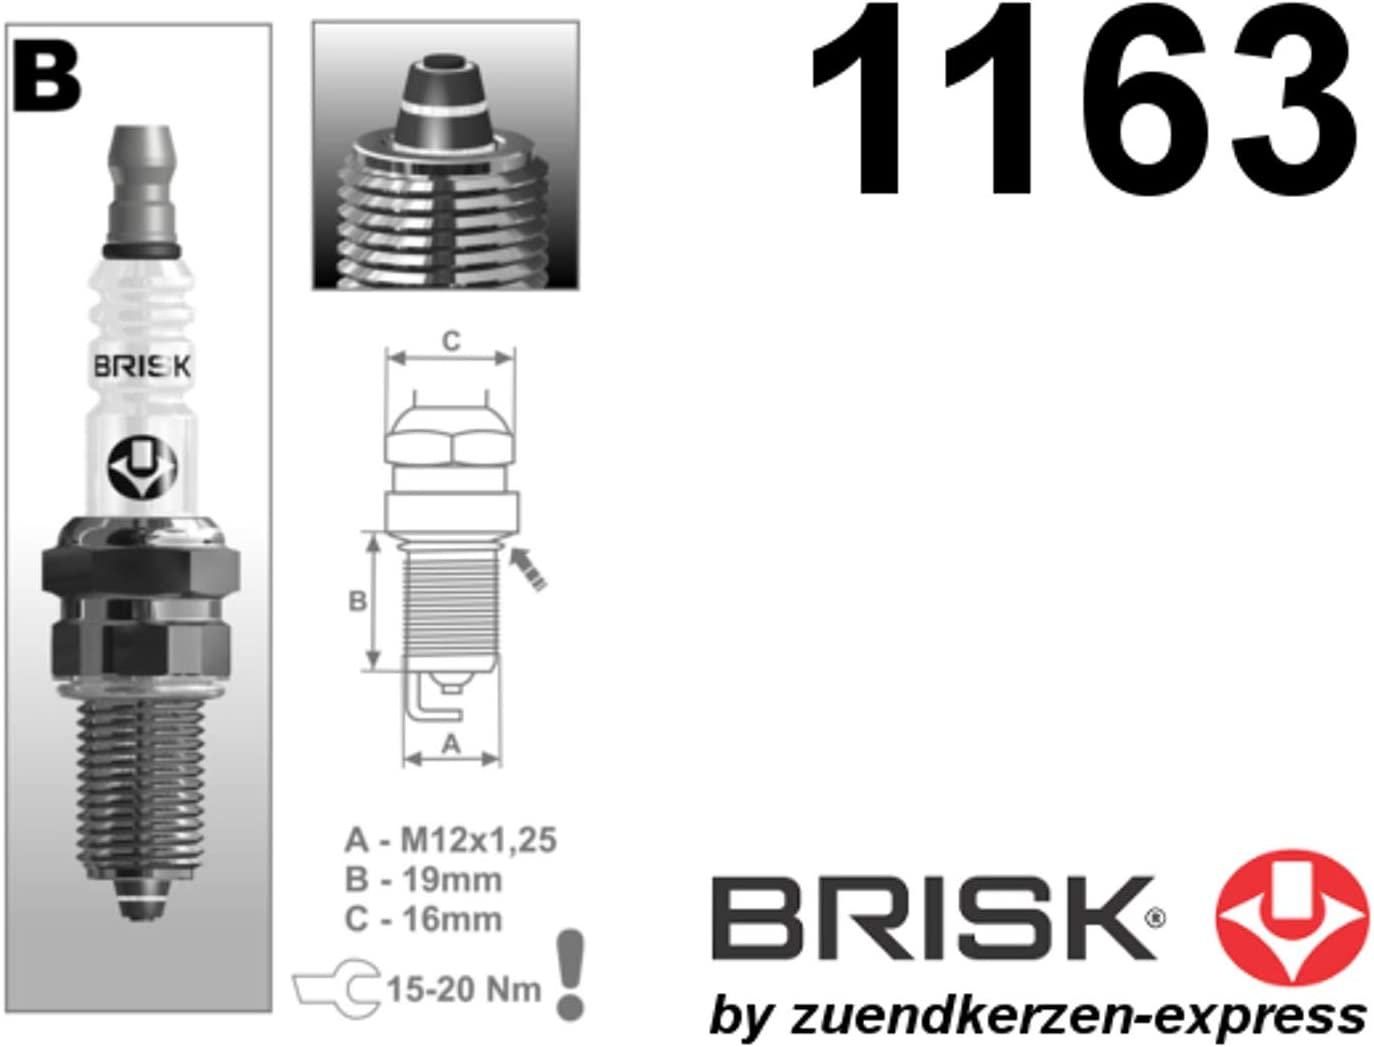 Brisk Premium Racing Br12zc 1163 Zündkerzen 4 Stück Auto